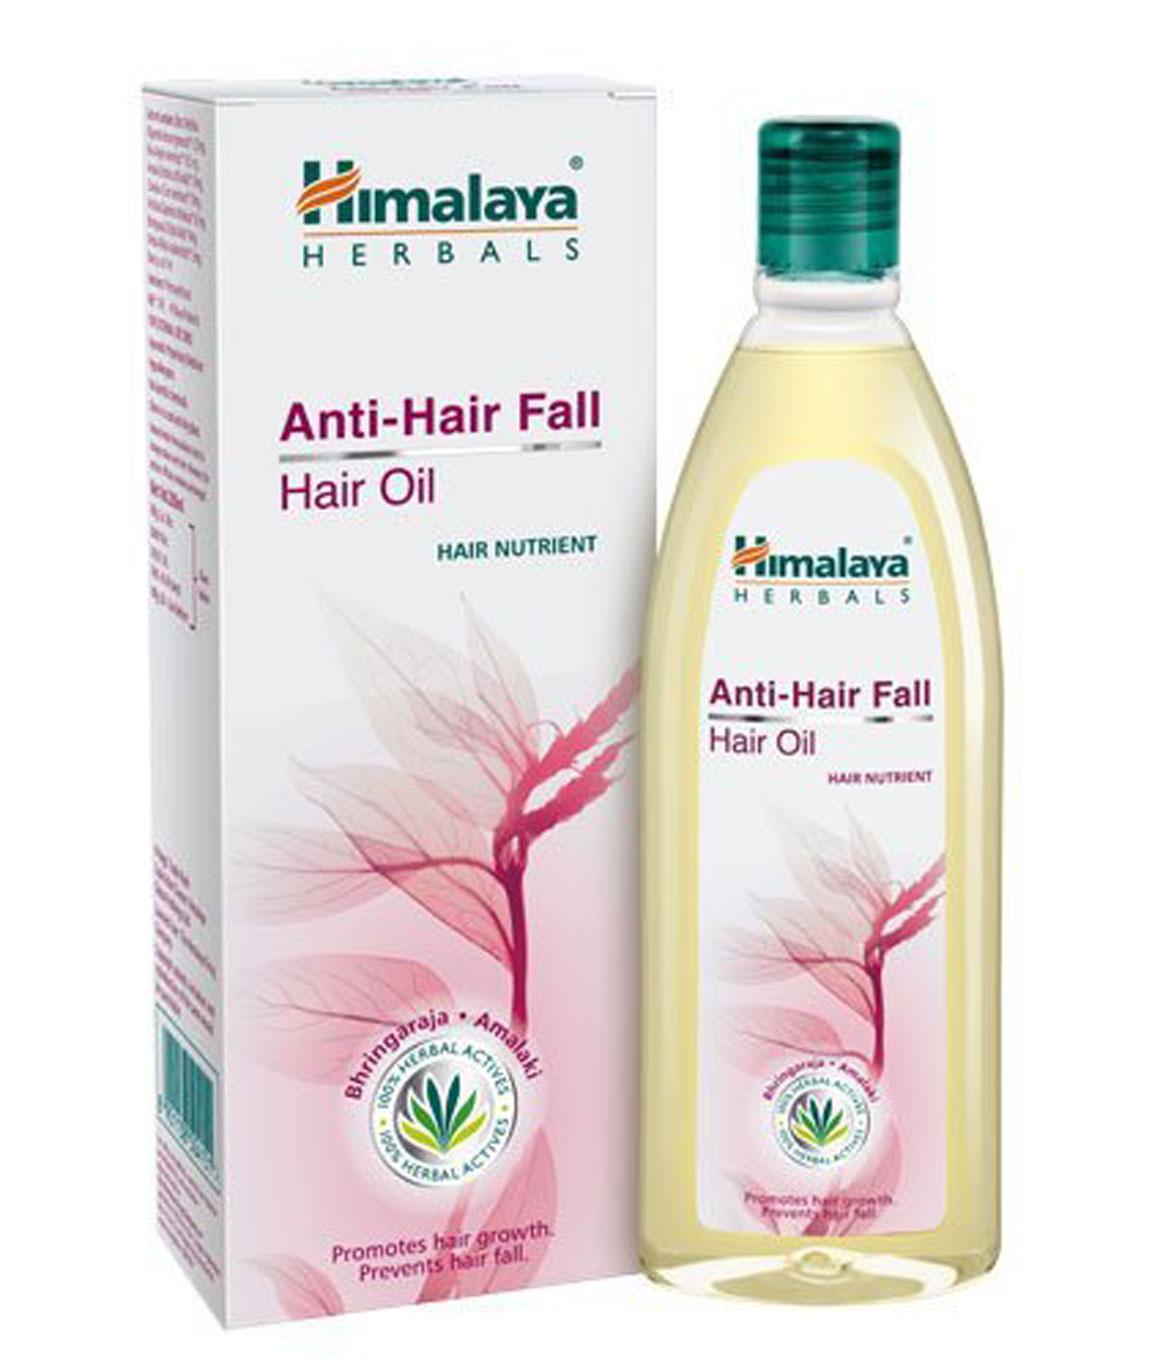 Himalaya Herbal Anti-Hair Fall Hair Oil, 200ml (sku12) - Pack of 1